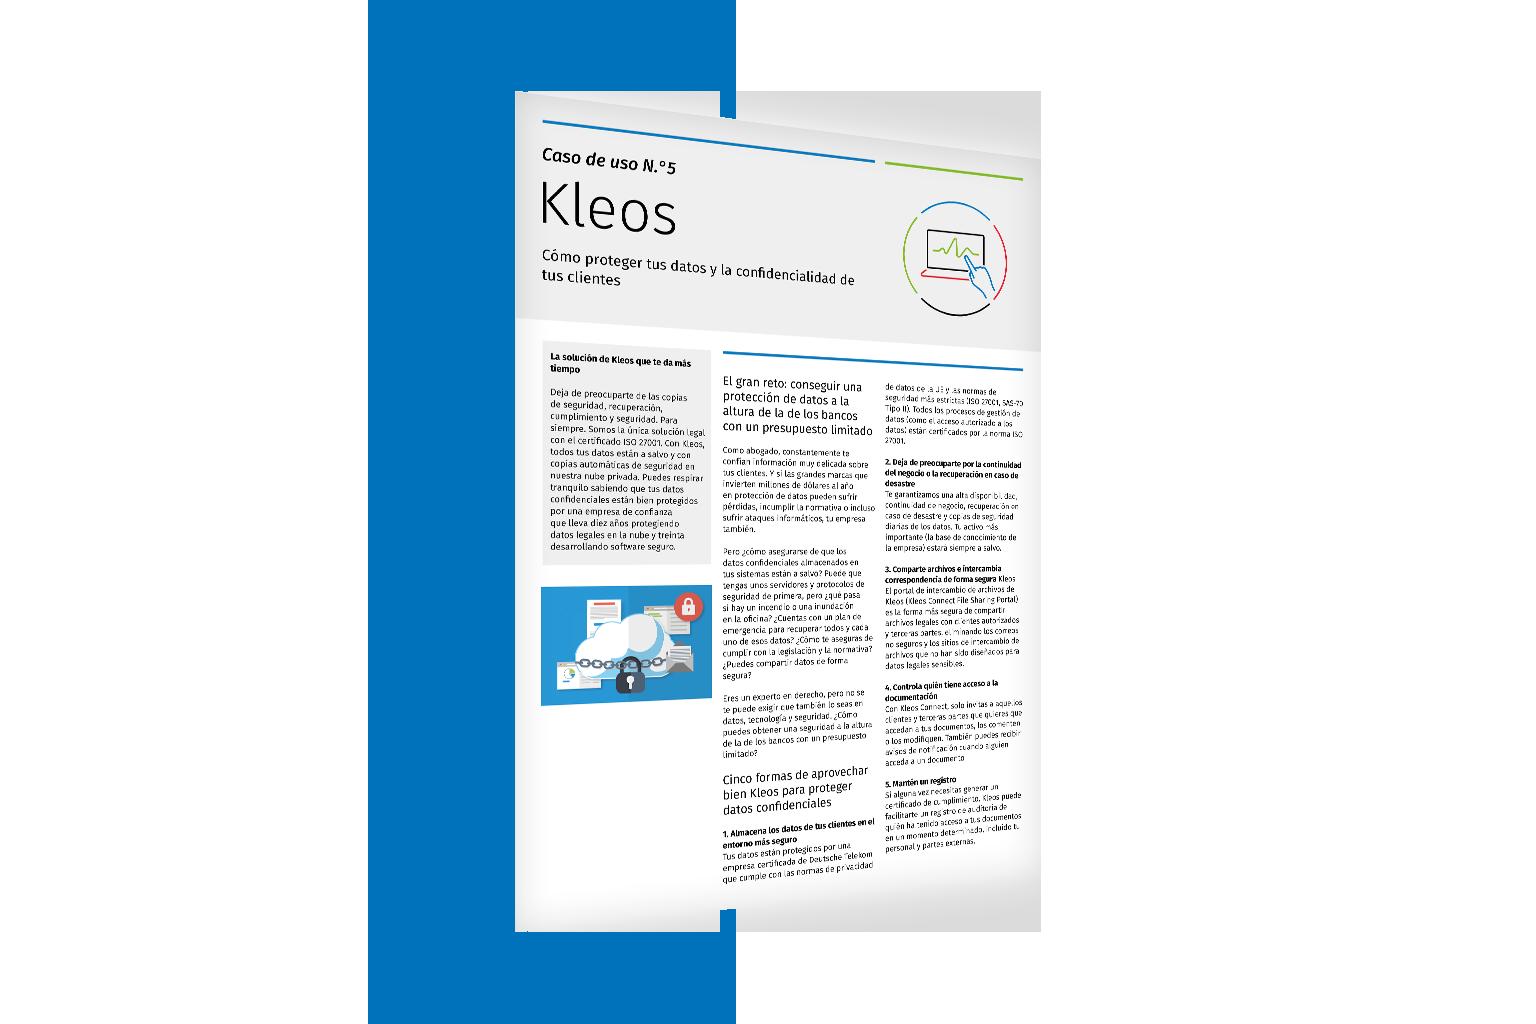 Kleos-Use-Case-5-Data-Protection-ES-1536x1024